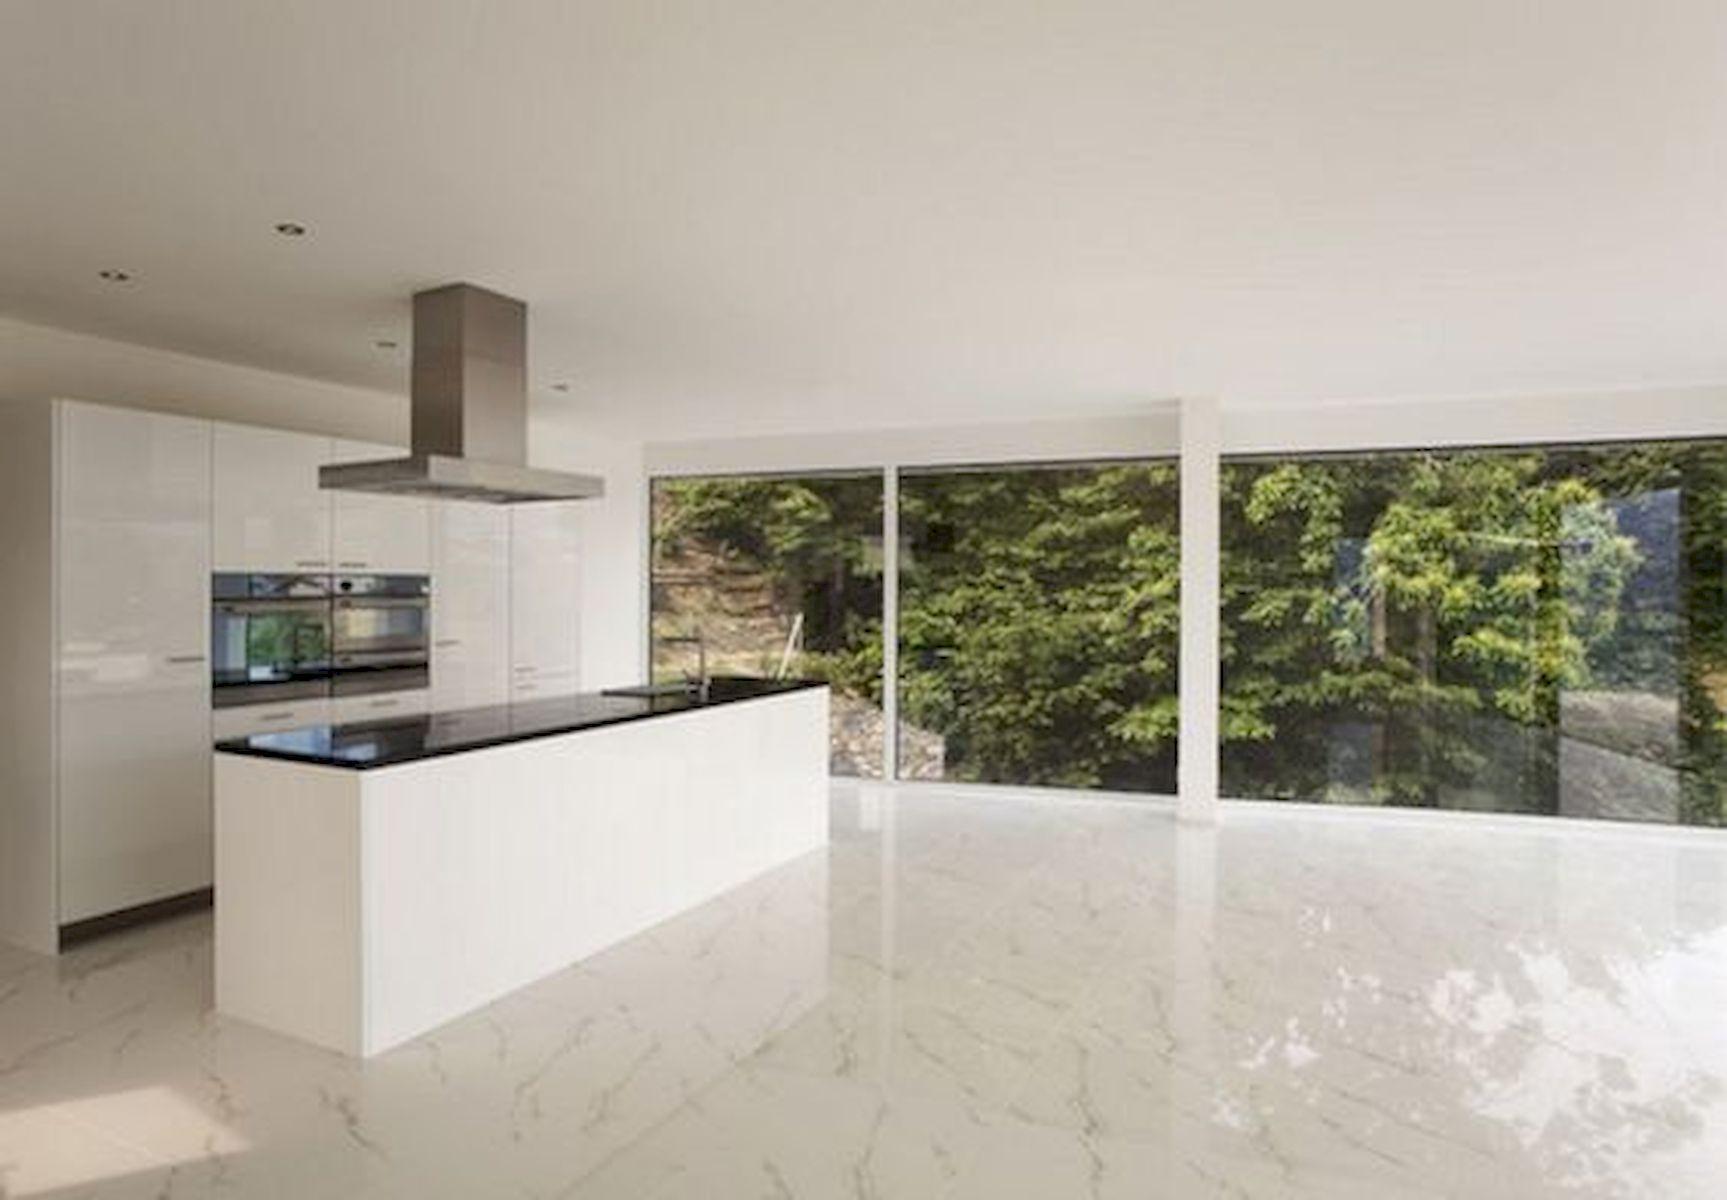 30 Best Kitchen Floor Tile Design Ideas With Concrete Floor Ideas (16)